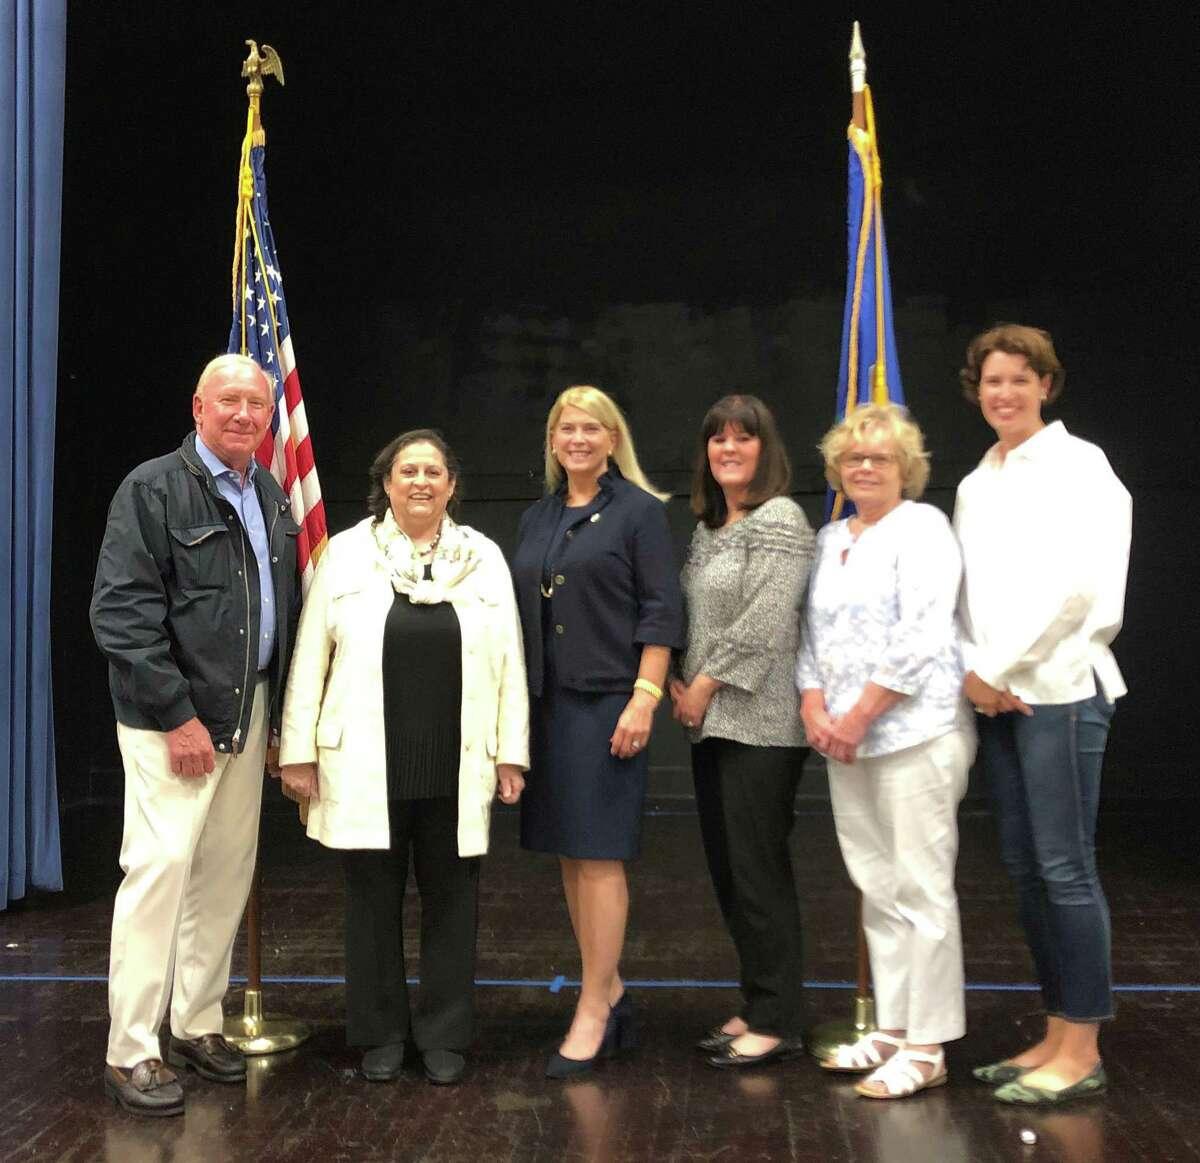 Republican Town Party 2019. From left, Kip Koons, Joan Hendrickson, Jayme Stevenson, Kathleen Larkins, Caryn Diller, D. Jill McCammon